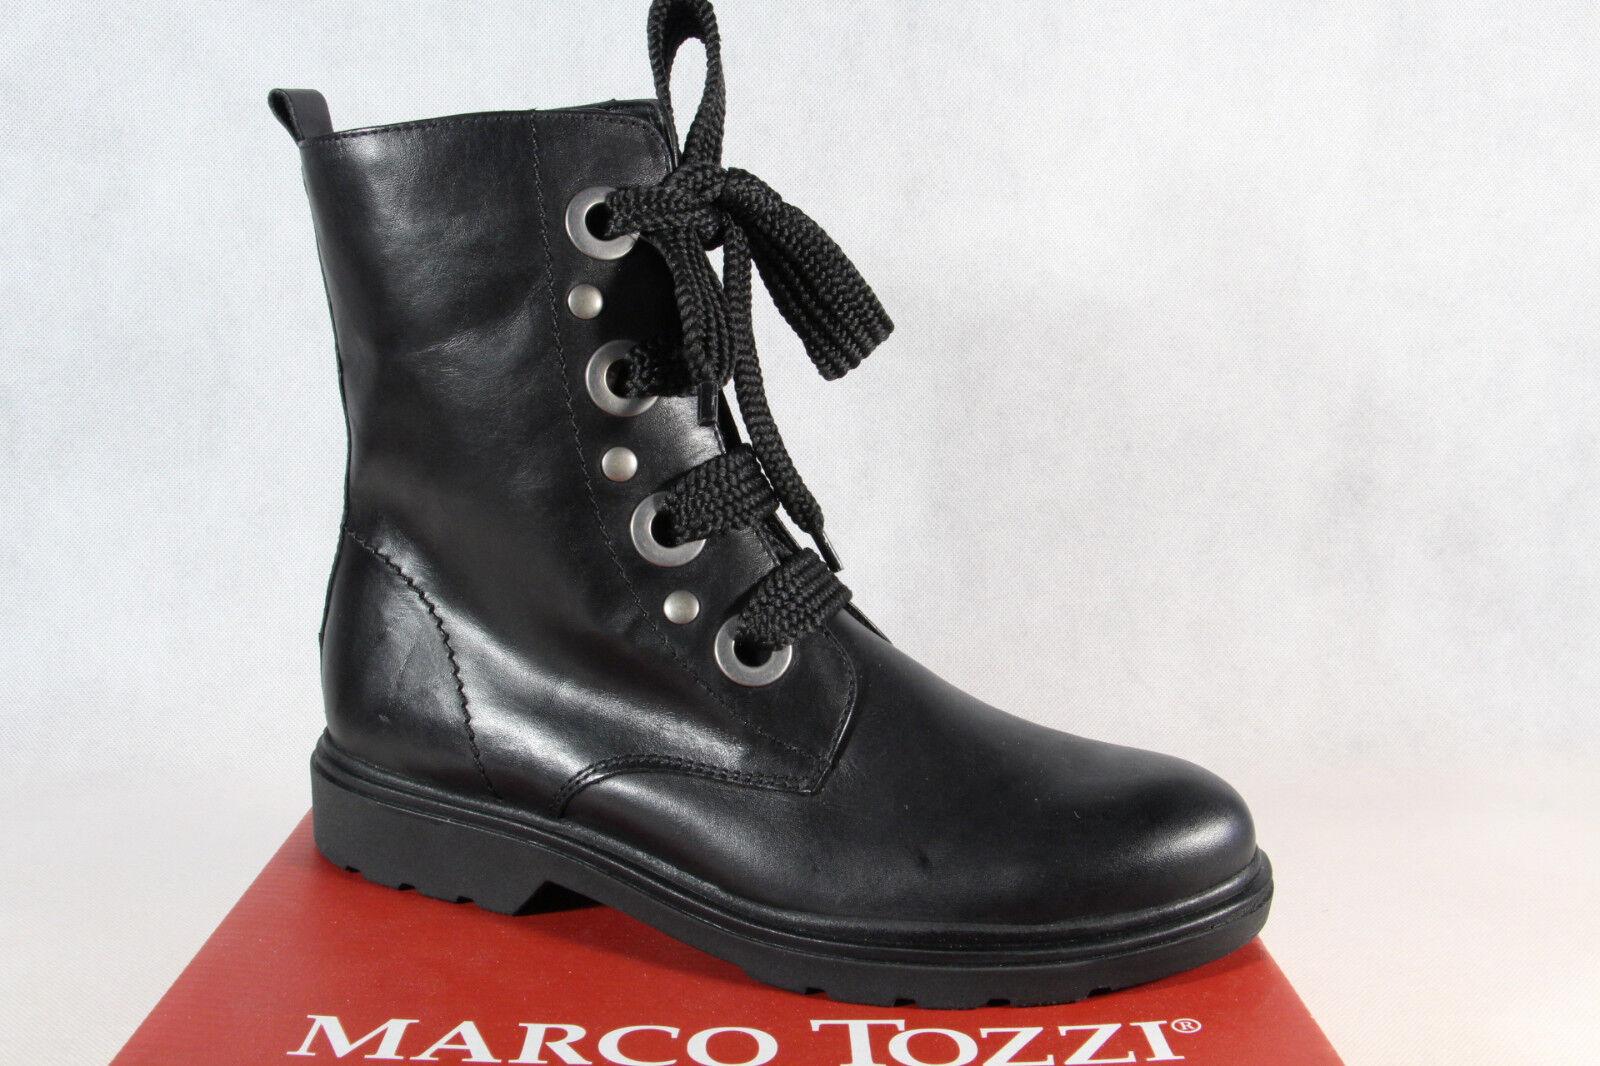 Marco Tozzi 25276 Damen Stiefel Stiefelette Boots Schnürstiefel schwarz NEU! c5669570f0